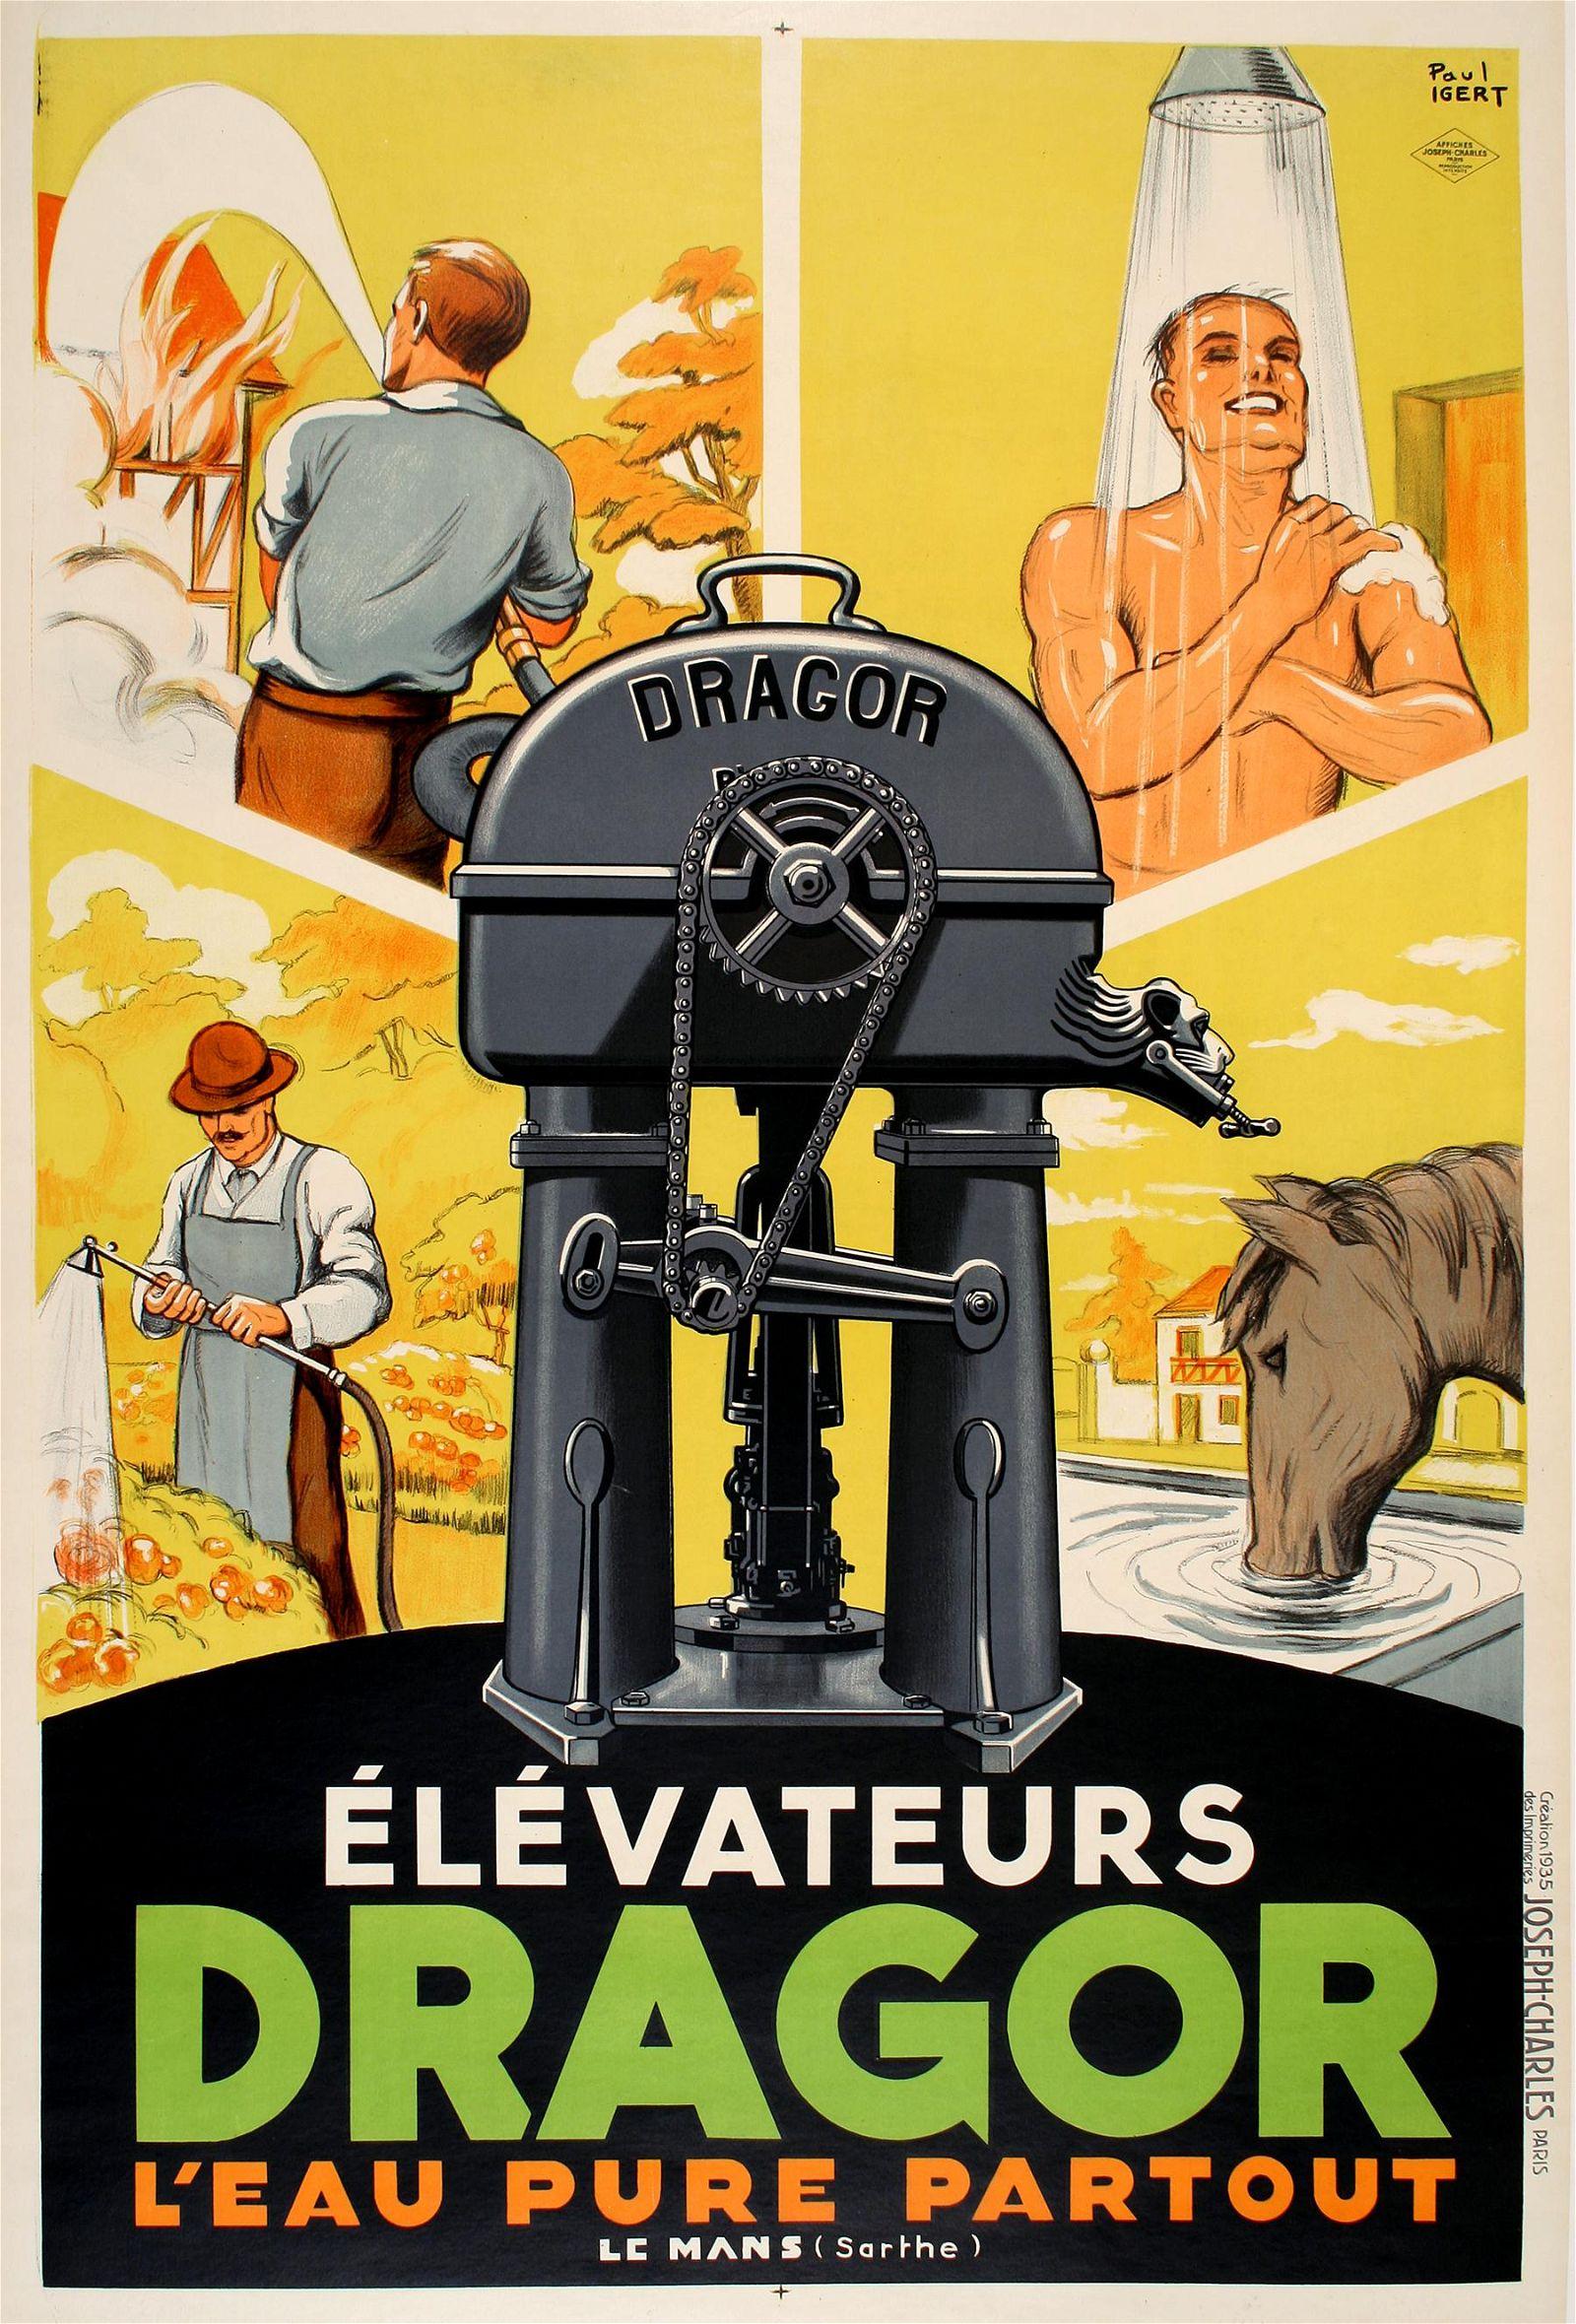 Original elevateurs Dragor Poster 1935 by Igert Water